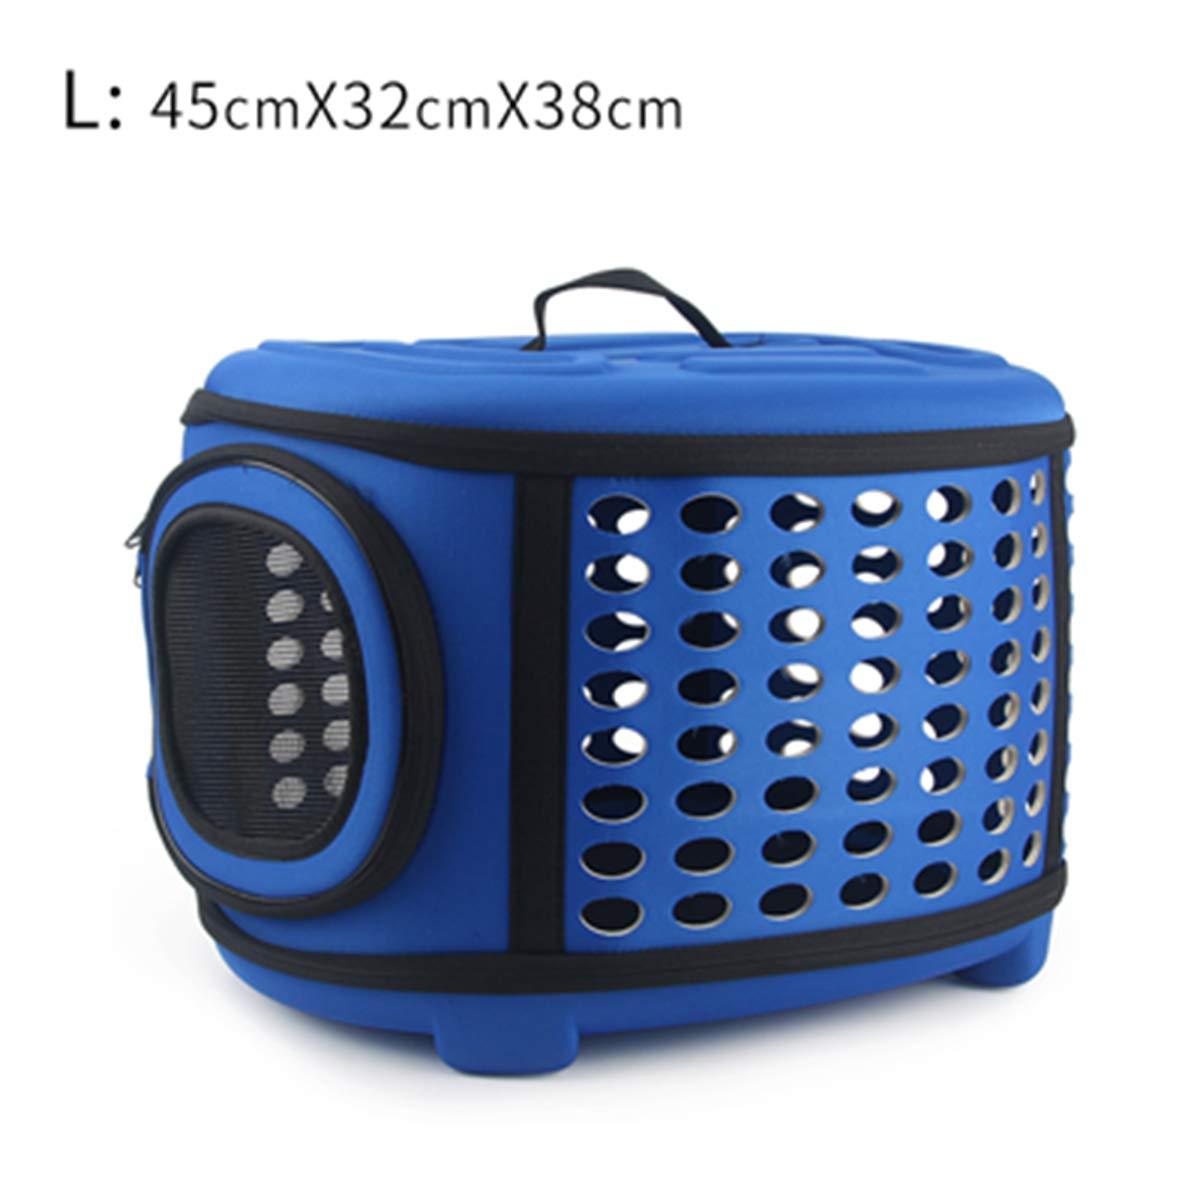 L bluee 45x32x38cm As Picture L bluee 45x32x38cm As Picture PETFDH Pure color Pet Carrier Bag Portable Outdoor Solid color Cat Foldable Dog Travel Pets Bag Puppy Carrying Shoulder Bags S M L L bluee 45x32x38cm